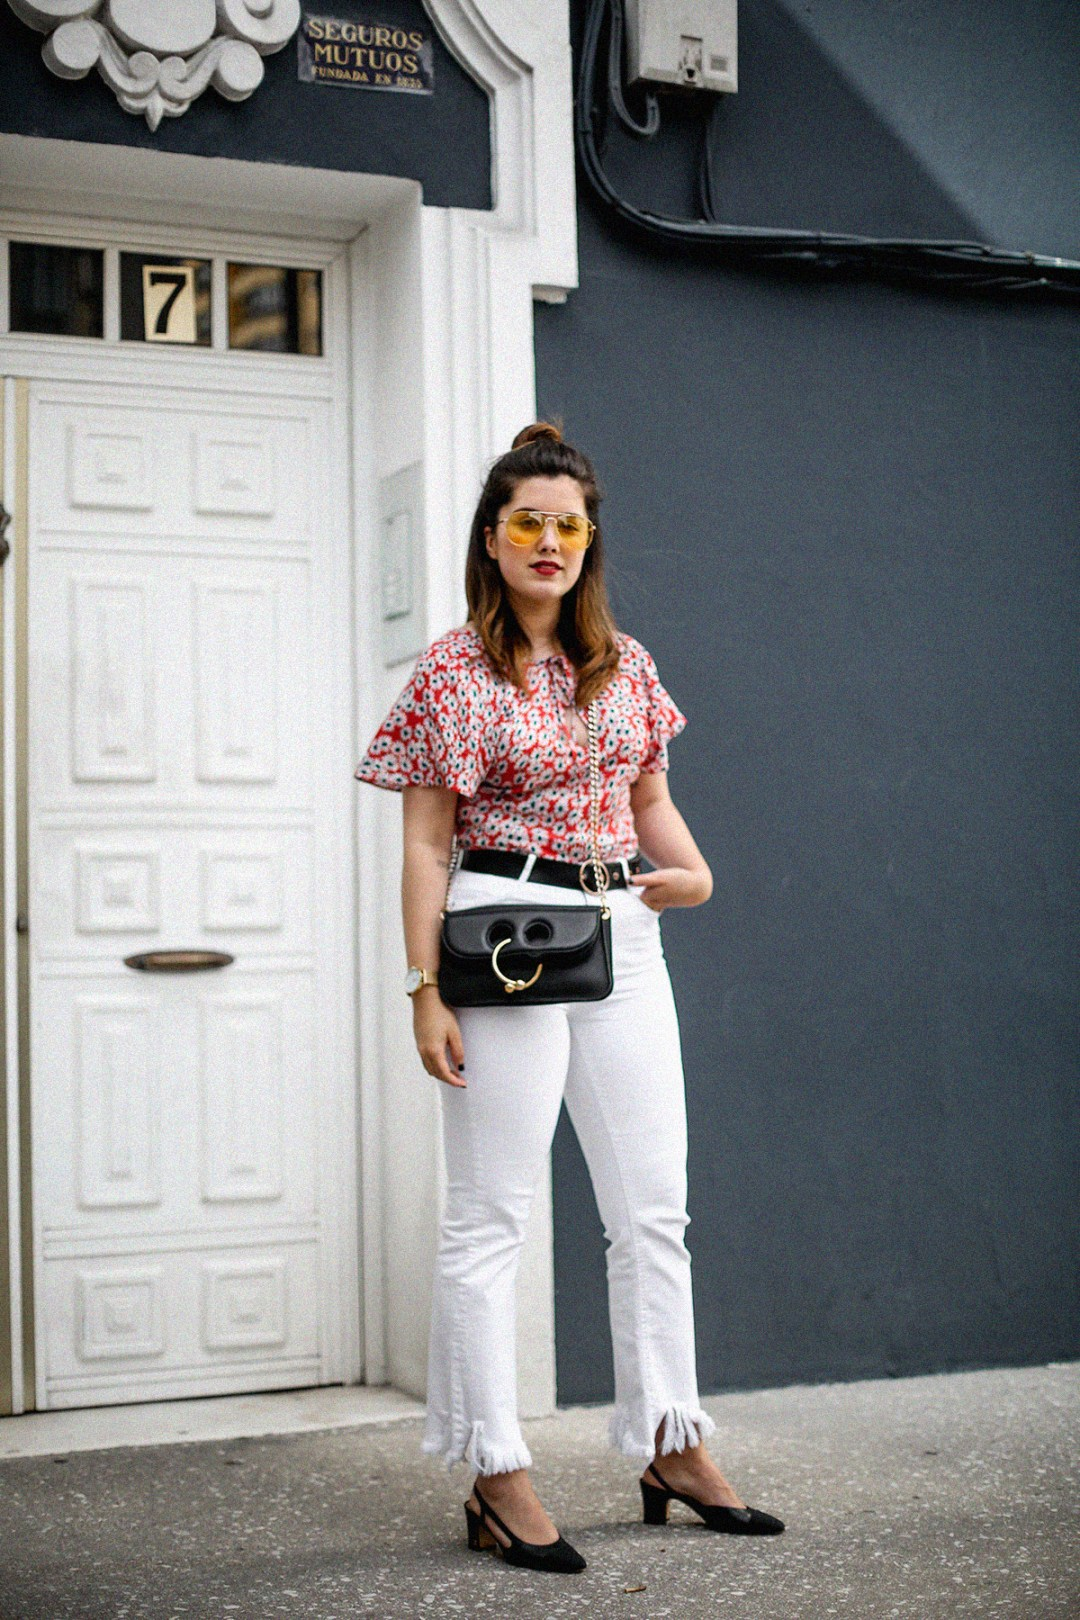 flower-top-zara-frayed-white-jeans-chanel-slingback-jw-anderson-bag-streetstyle13